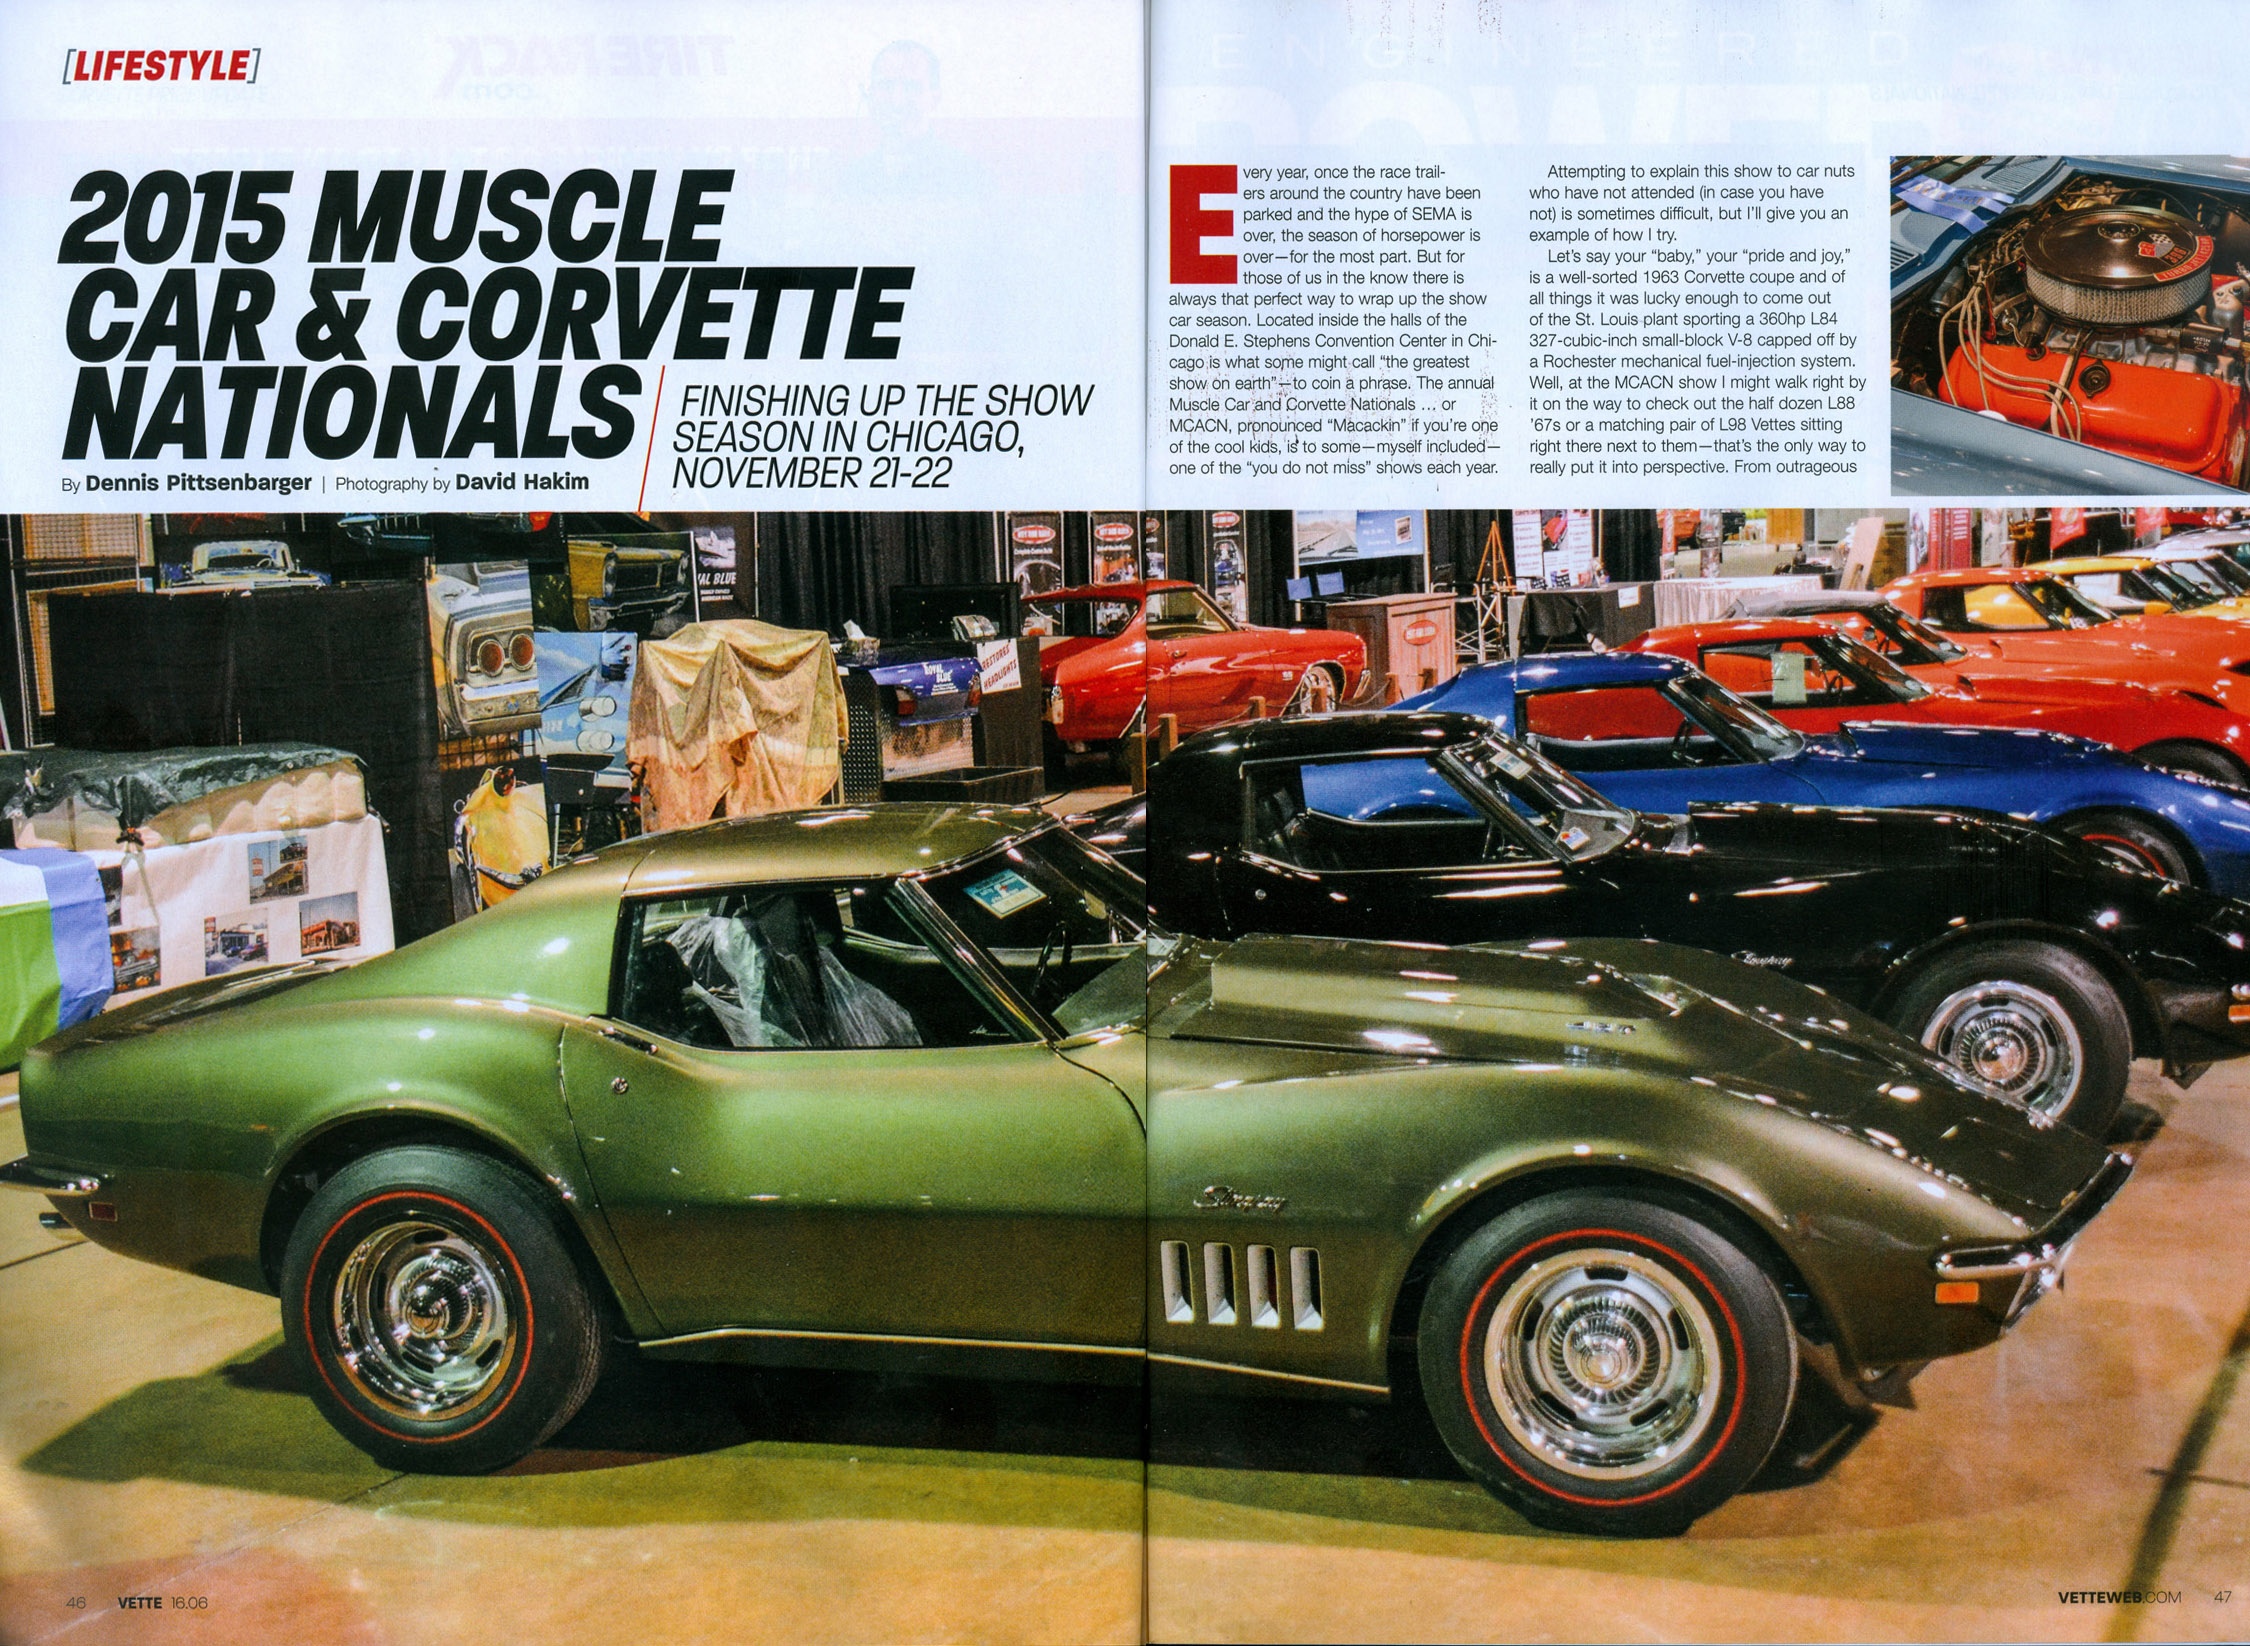 Vette Magazine June 2016 2015 Muscle Car Corvette Nationals